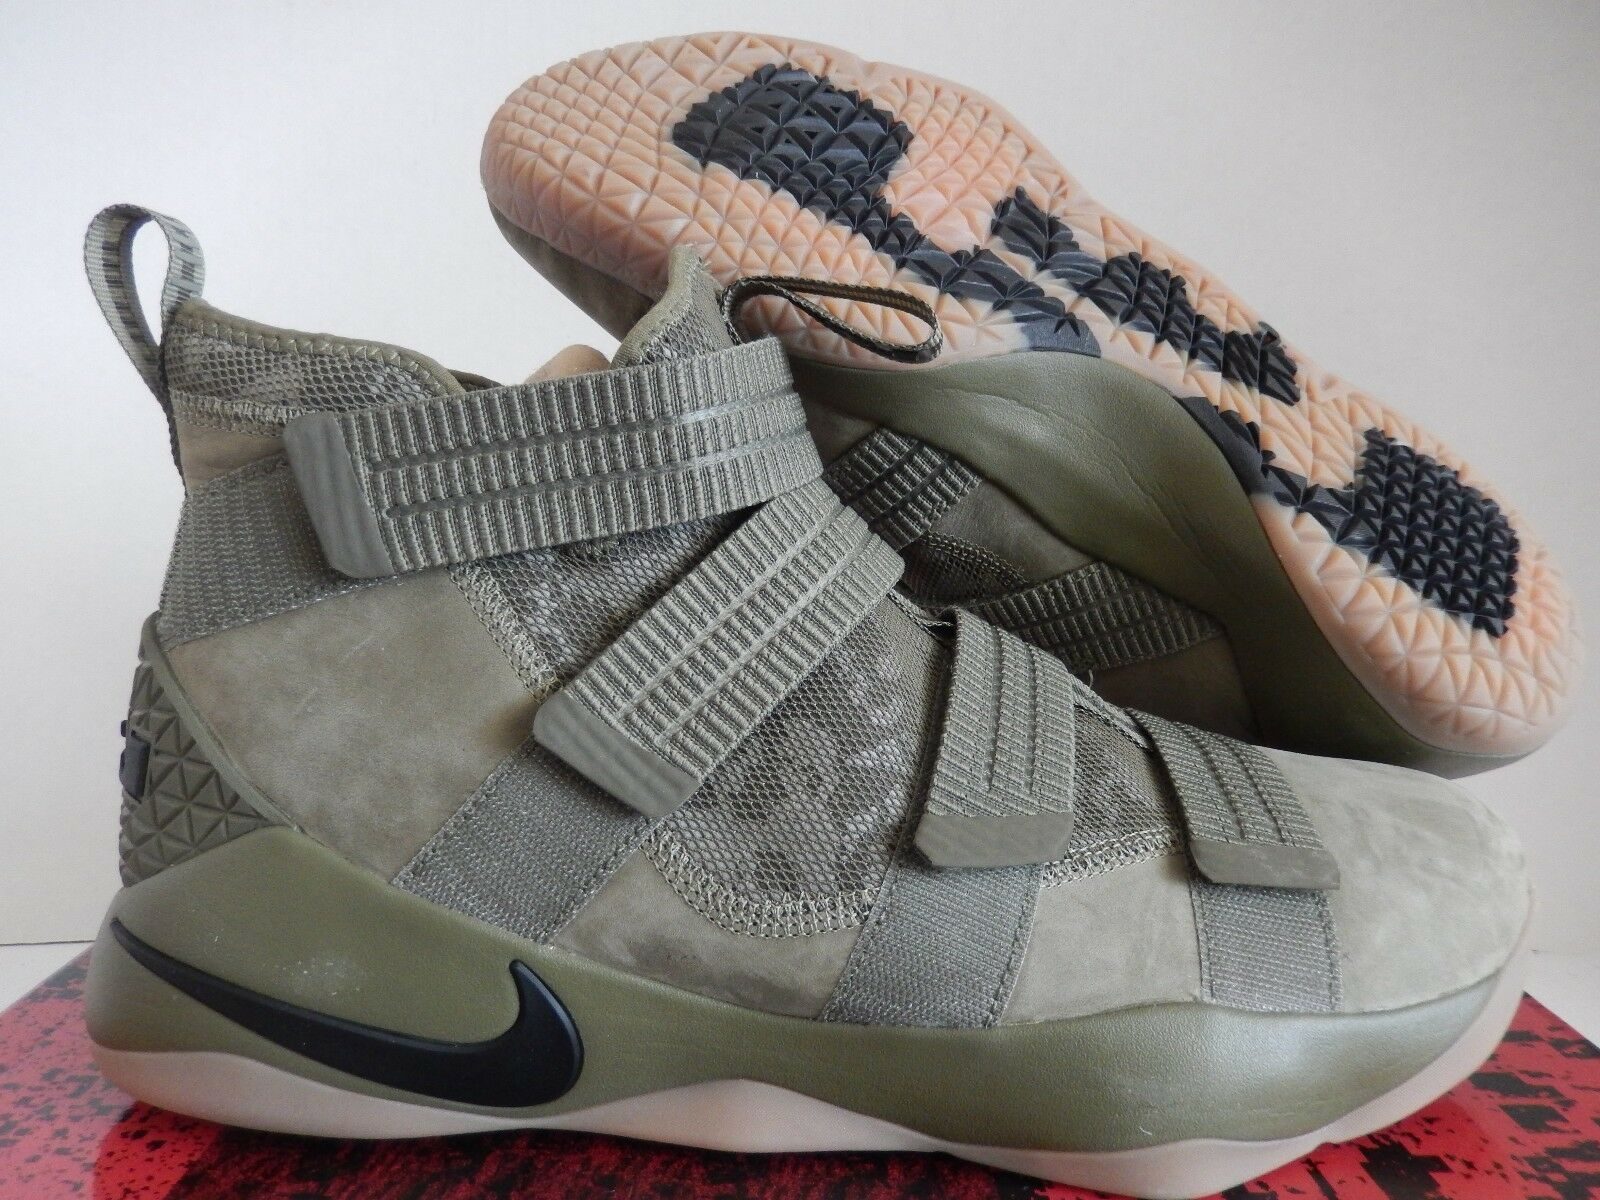 Nike Nike Nike lebron soldato xi sfg medio olive green-nero-nero sz 14 [897646-200] 7392fa